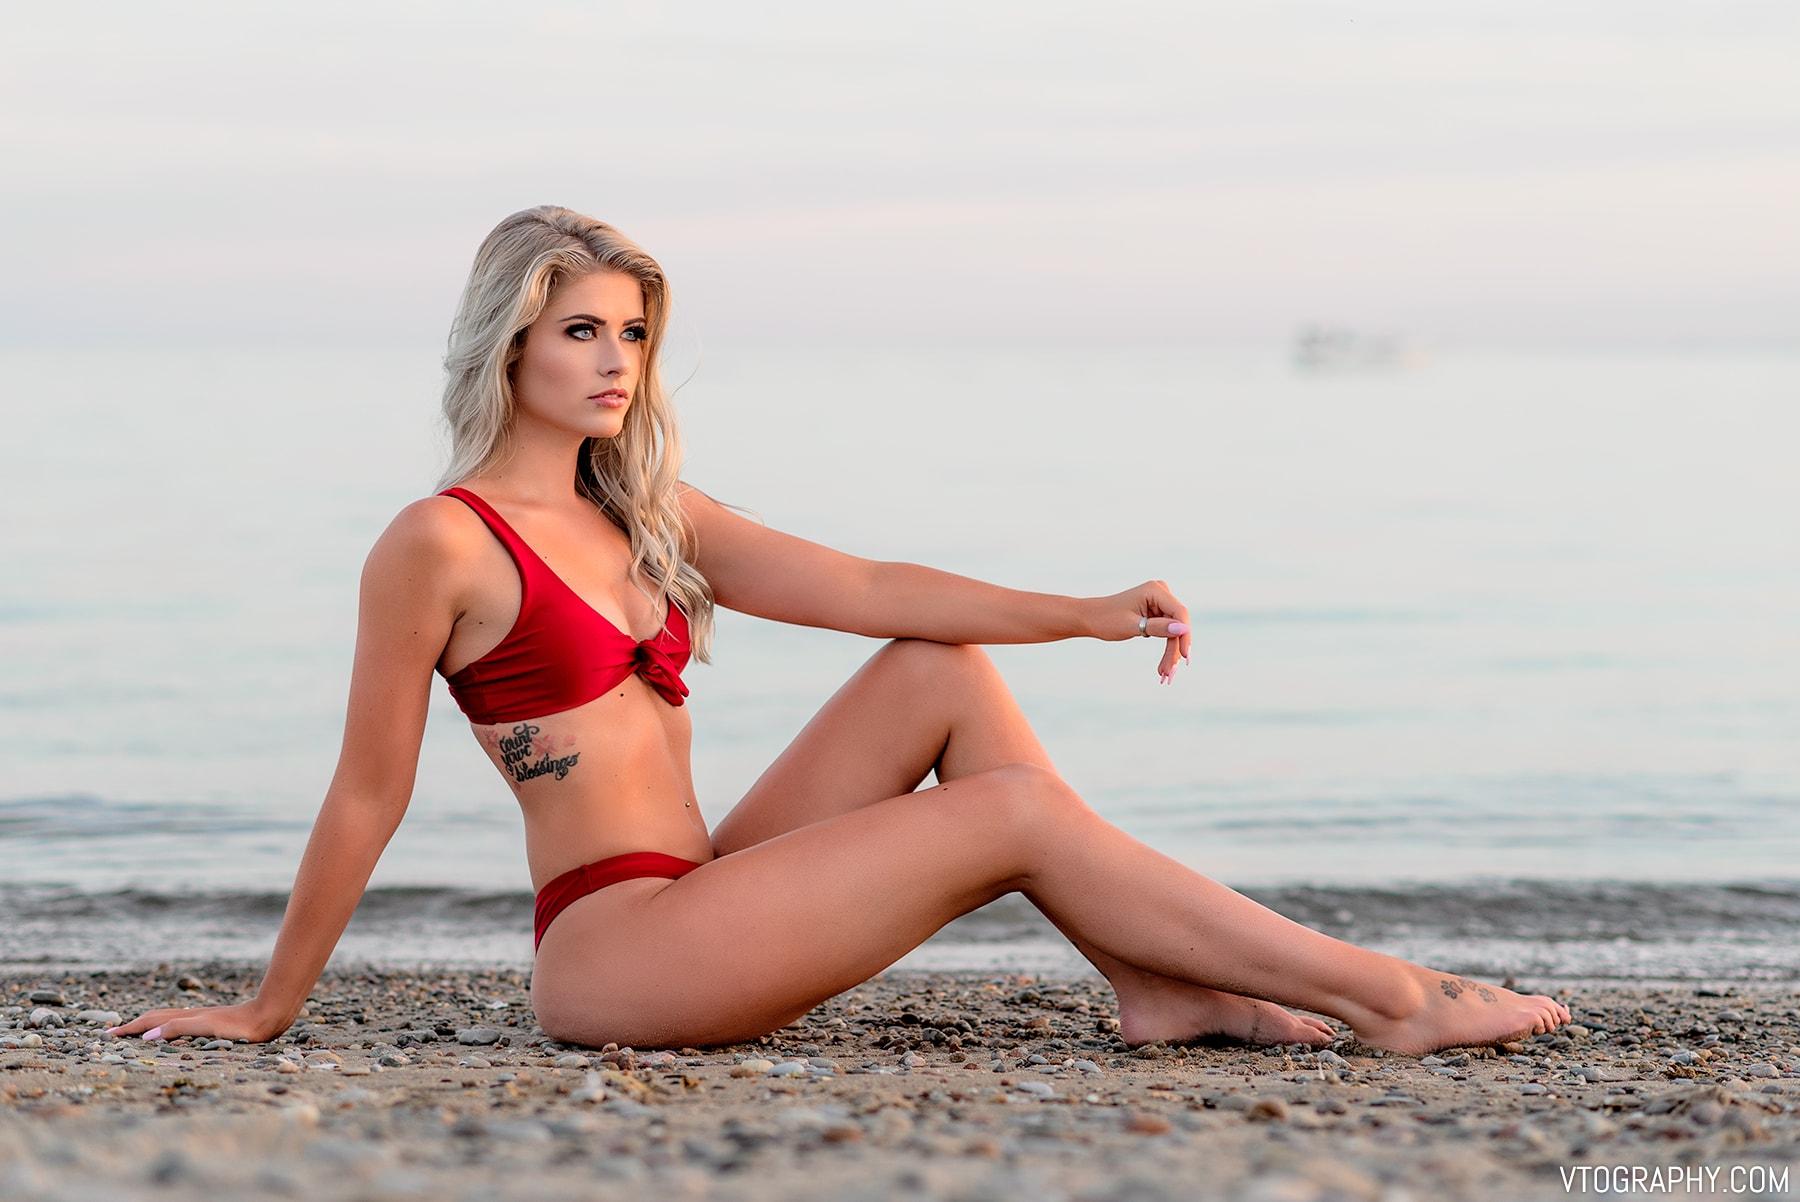 Zaful scrunch butt knotted thong tie-front red bikini (Summer 2018)